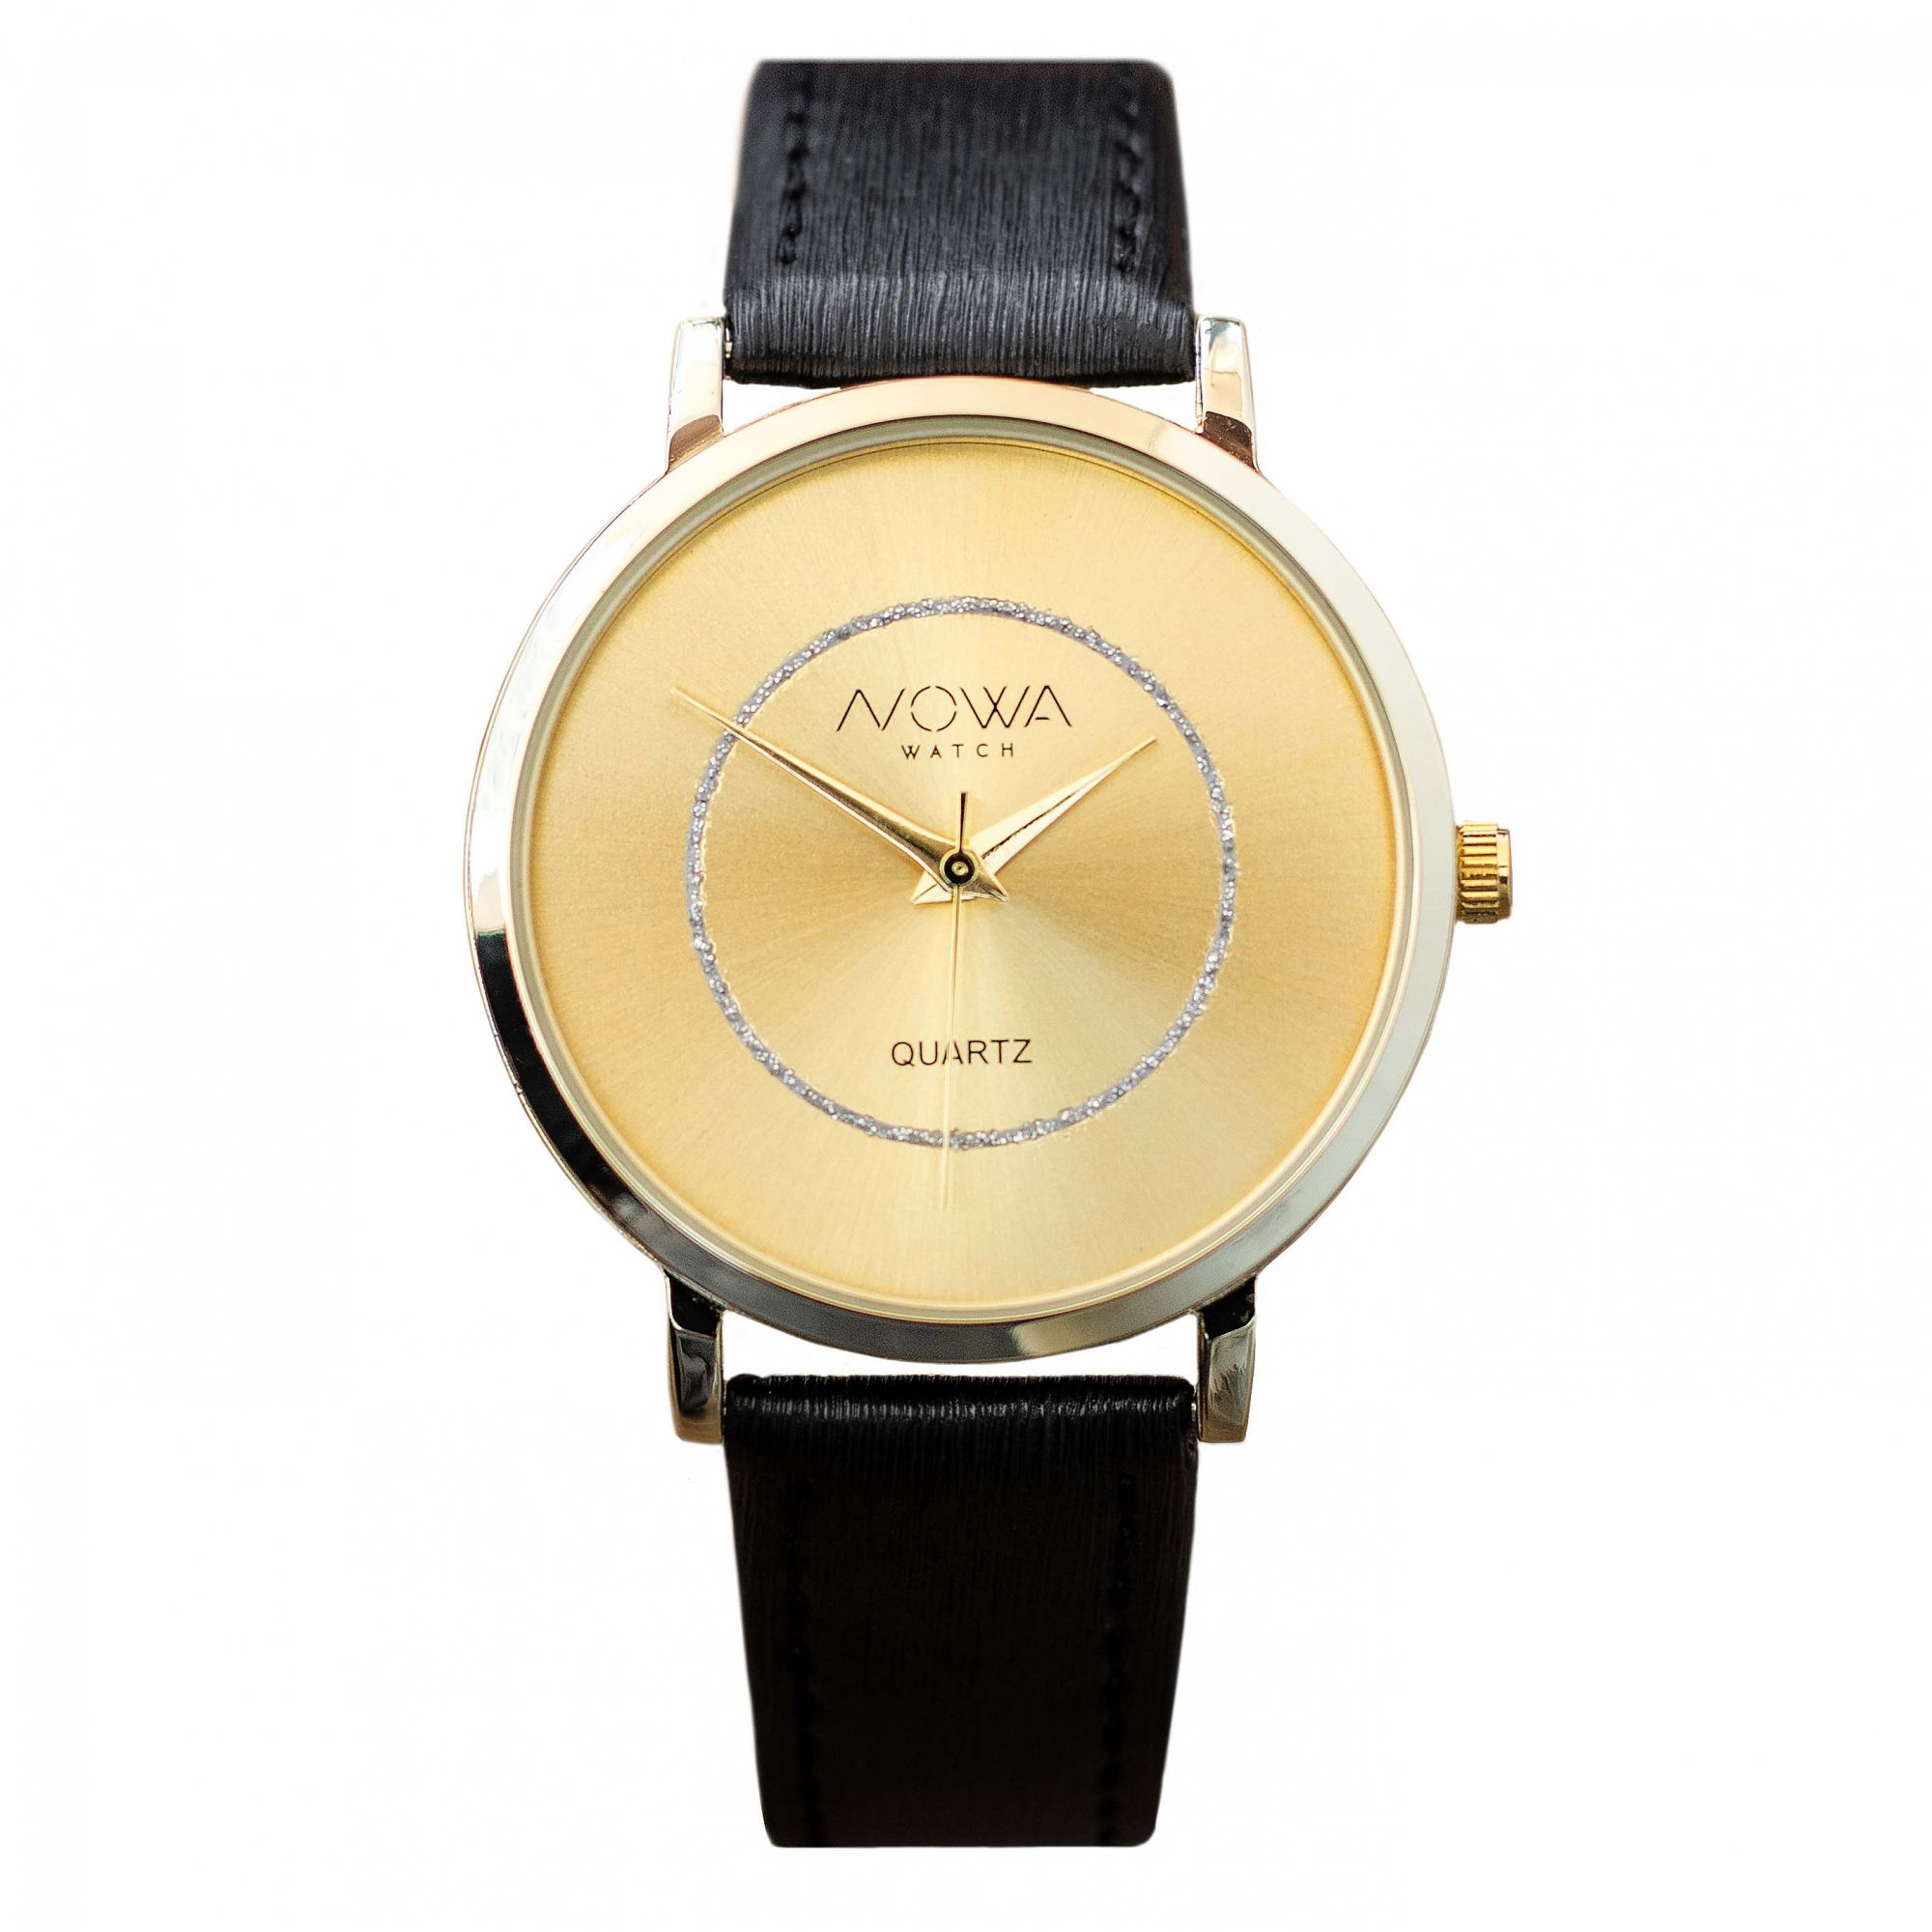 Relógio Nowa Feminino NW1409K Couro